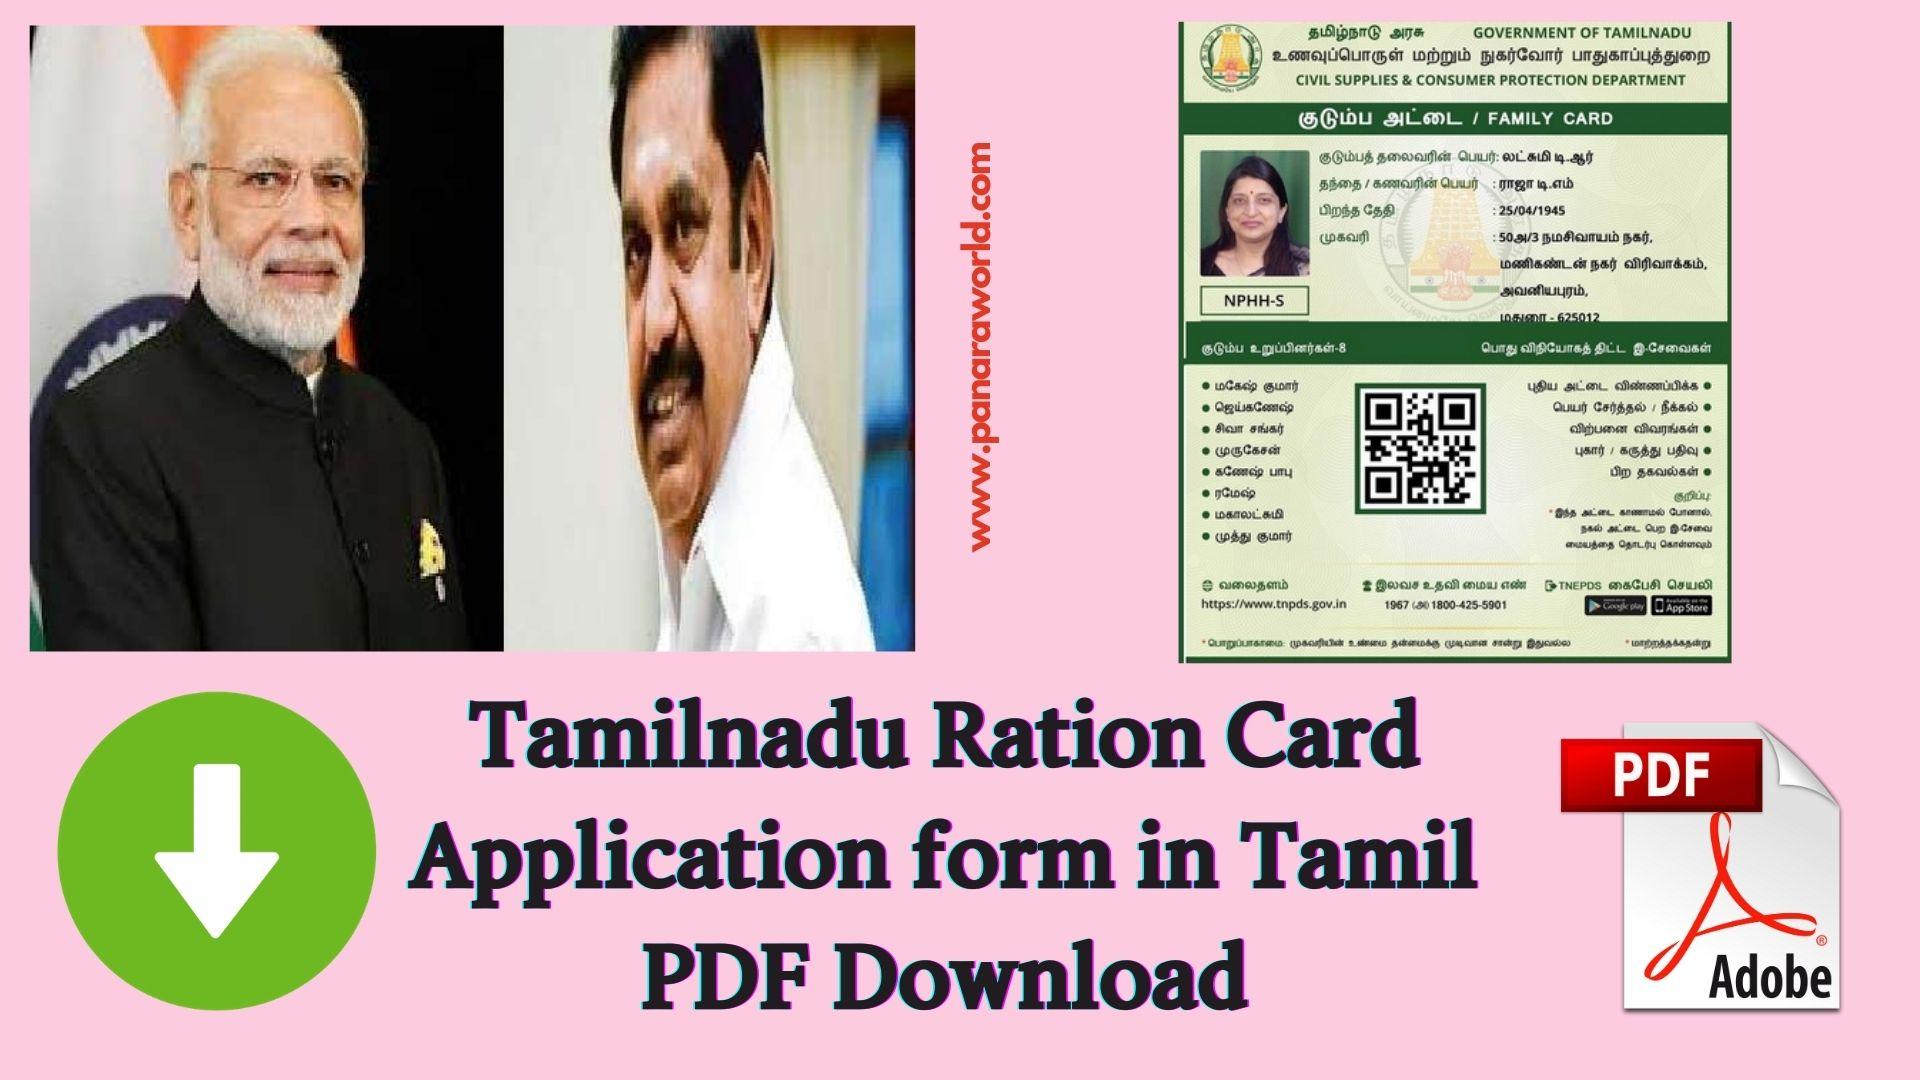 Tamilnadu Ration Card Application form pdf